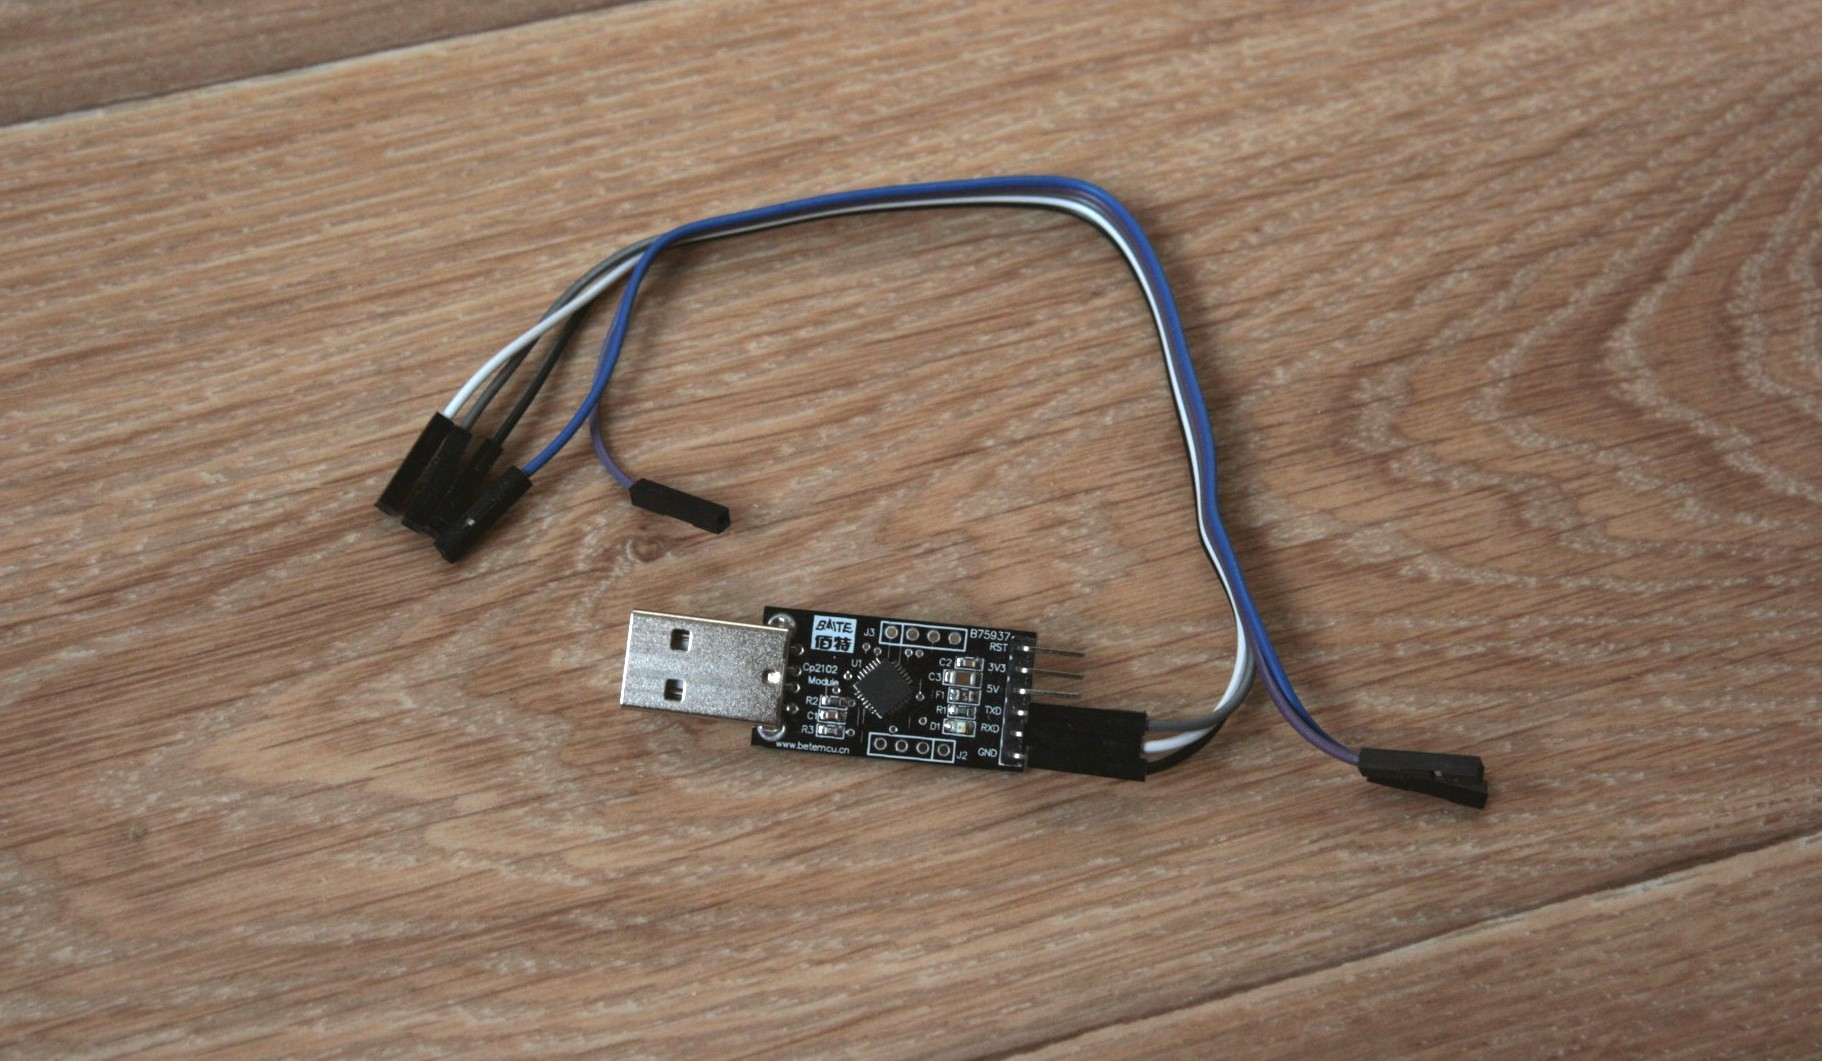 USB to UART adapter